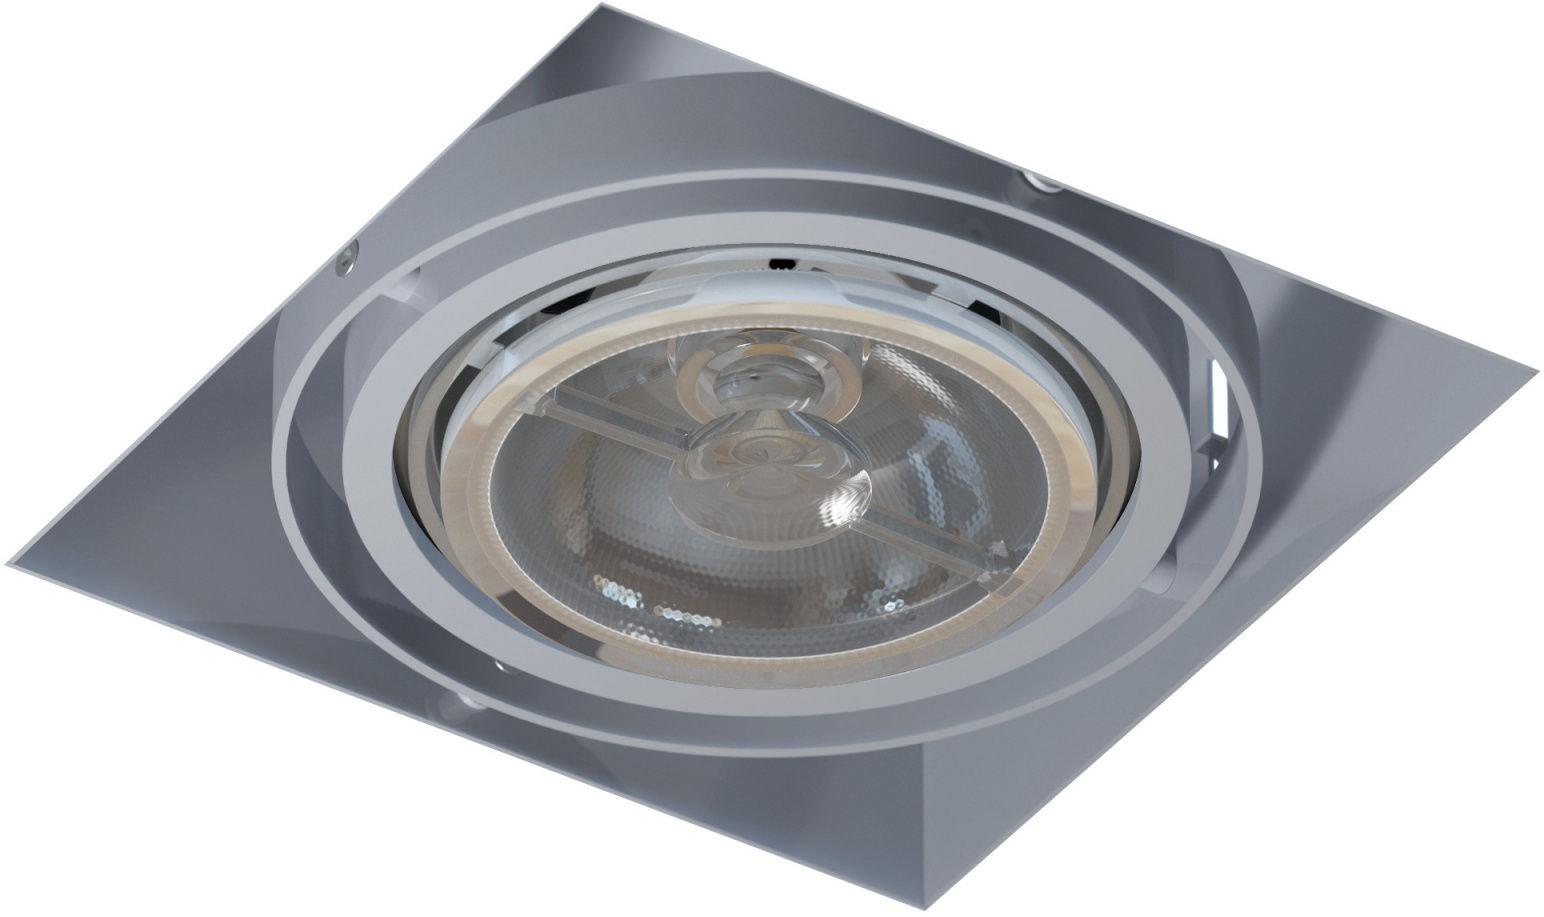 Oprawa wpuszczana bezramkowa Mara T018PB1Ah101 Cleoni nowoczesna lampa sufitowa